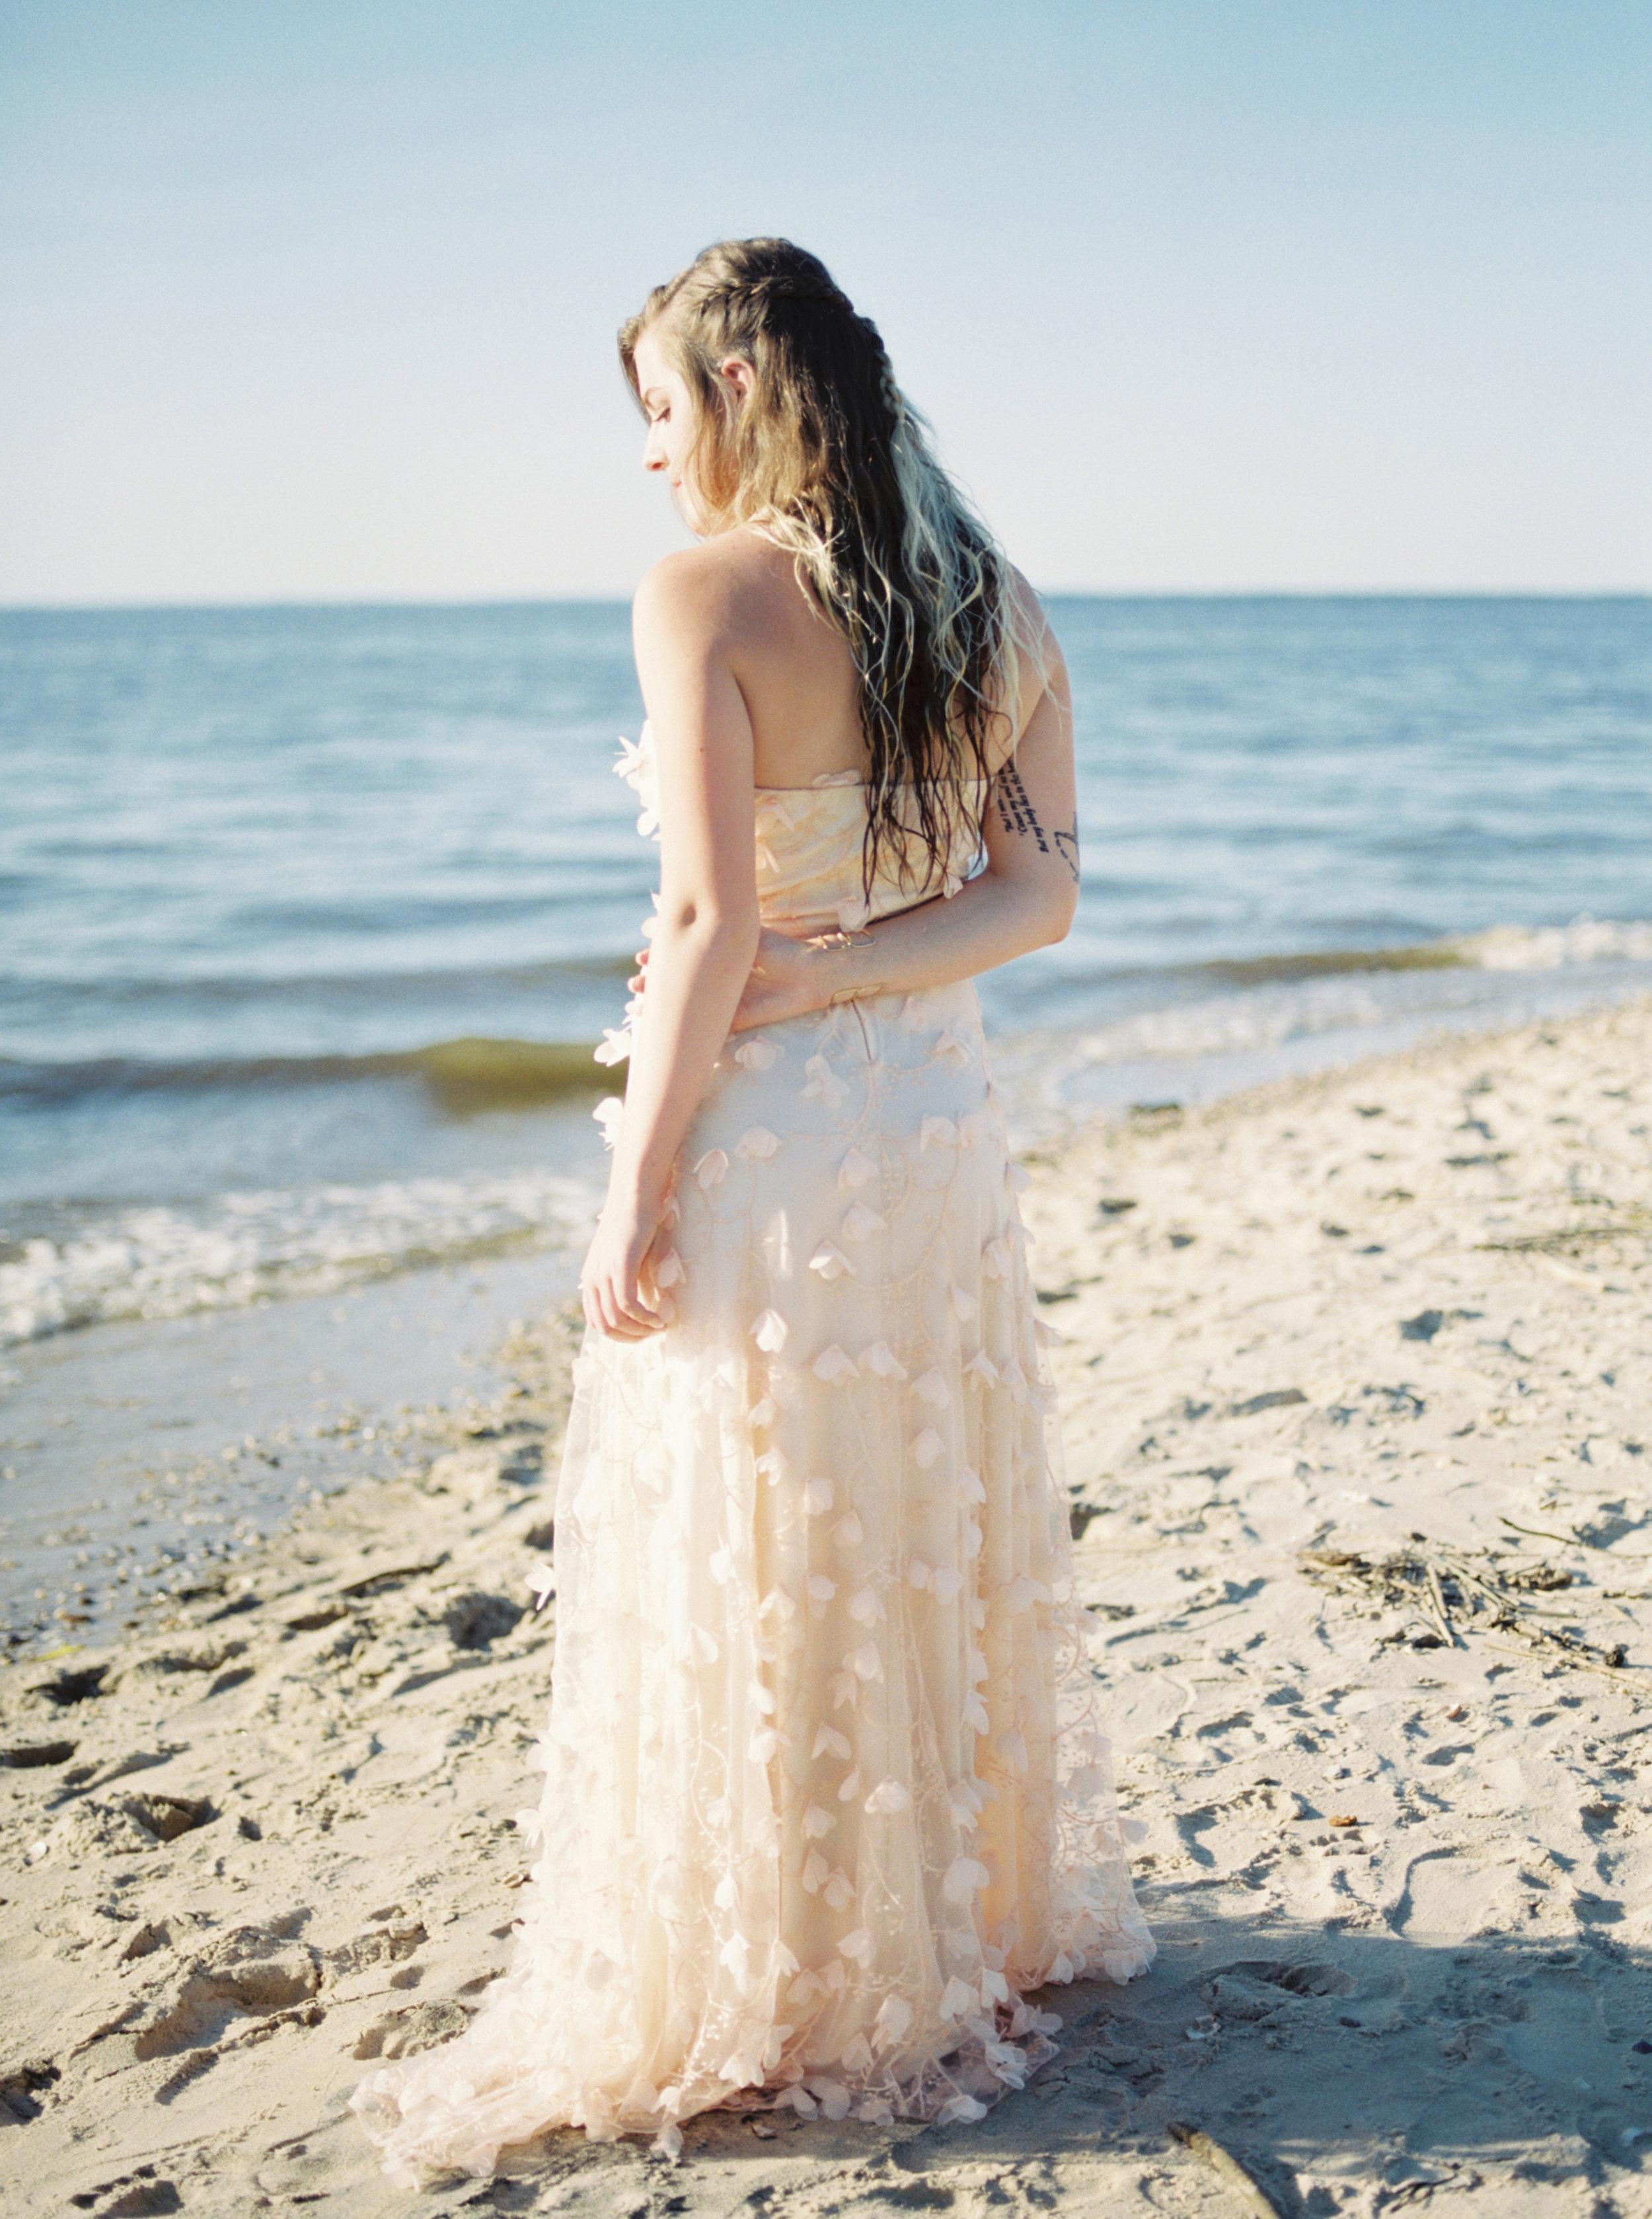 The Little Mermaid (24).jpg